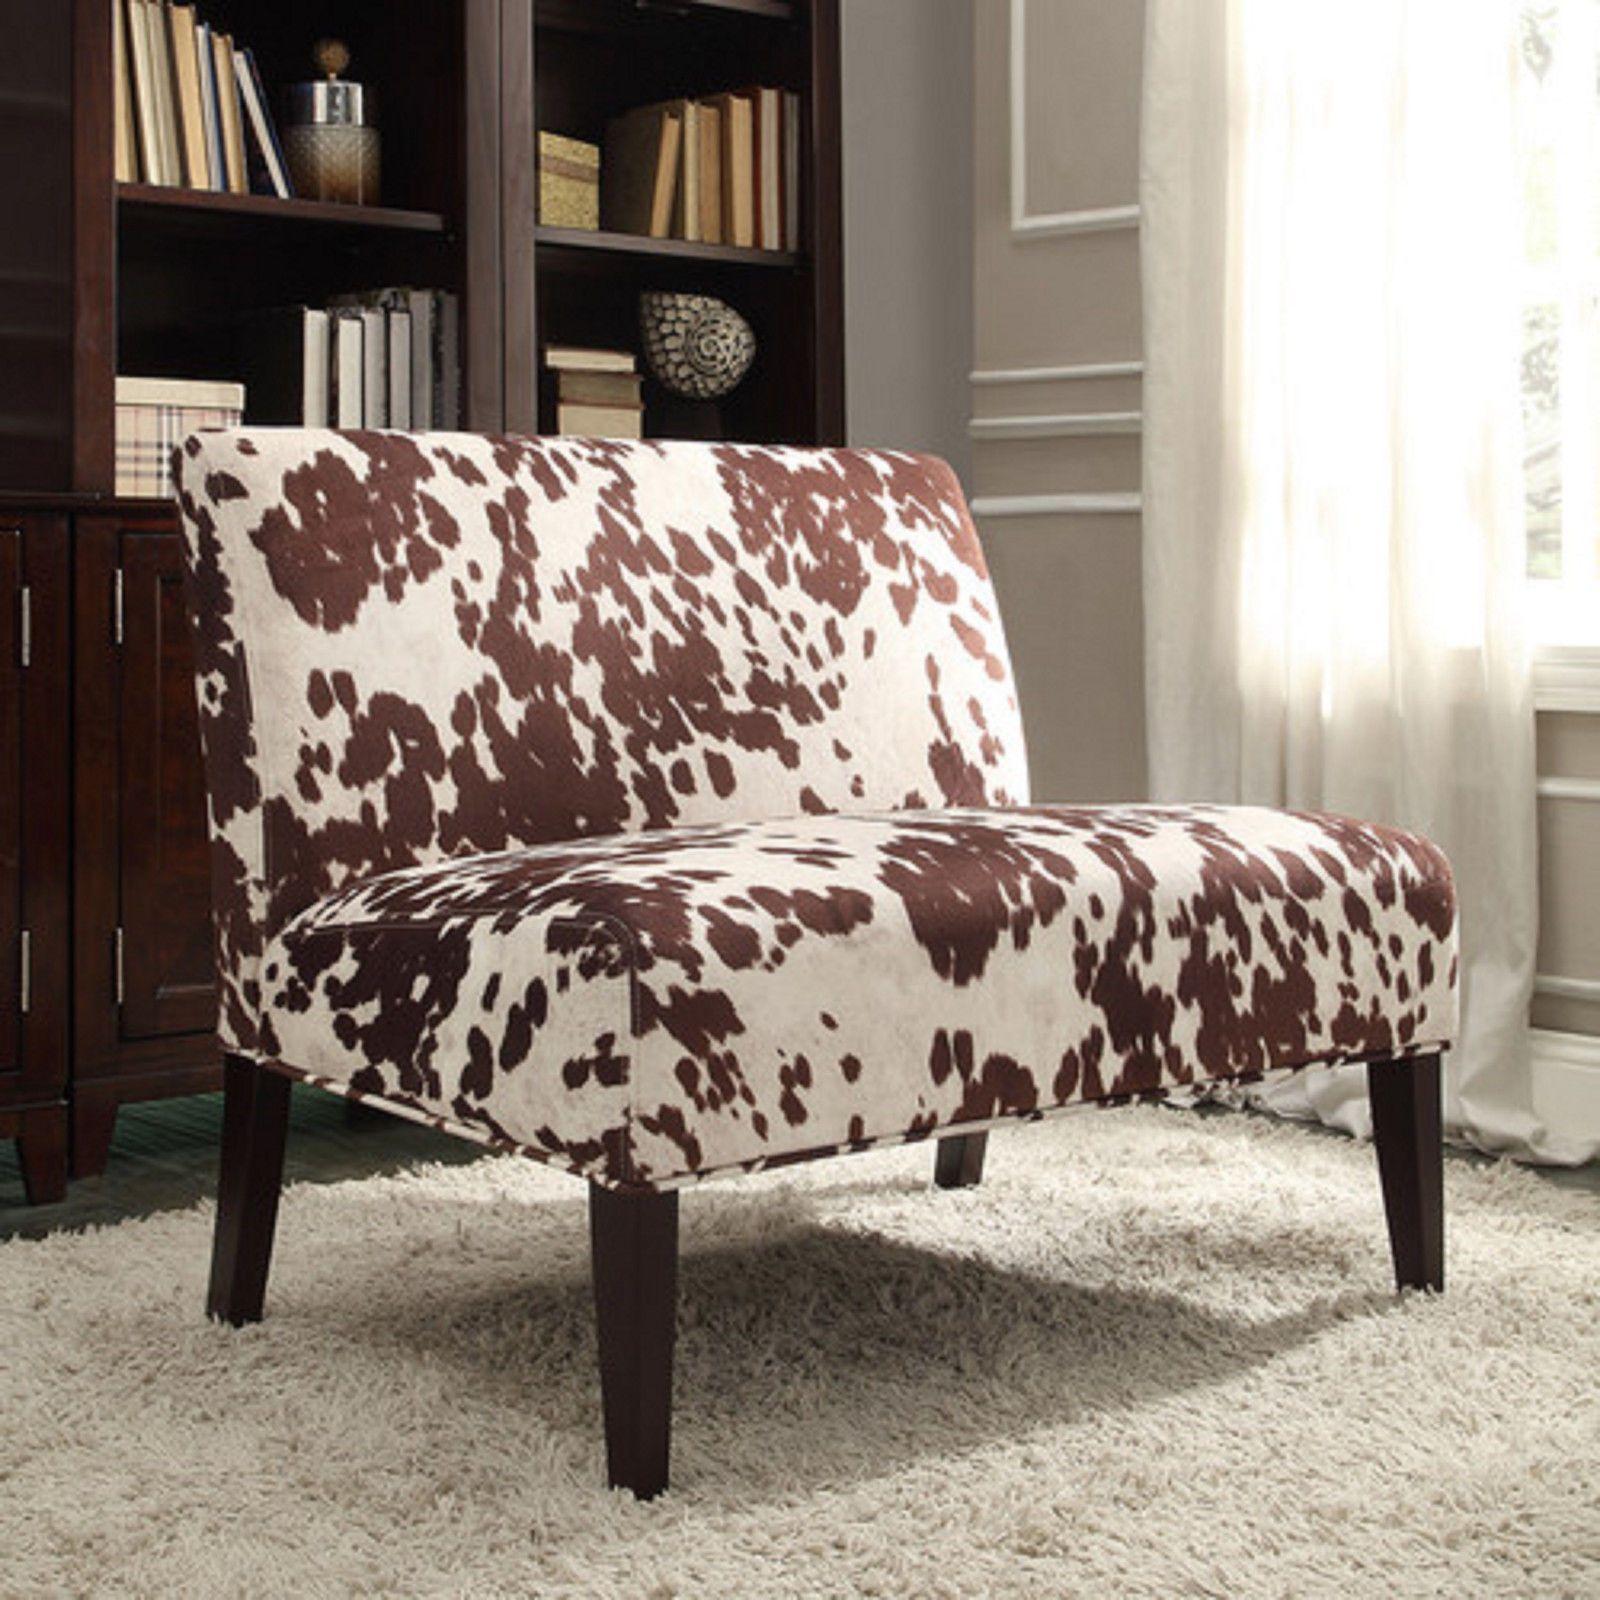 Cowhide Print Accent Chair Black Covers Bulk Brown Cow Hide Furniture Fabric Loveseat Love